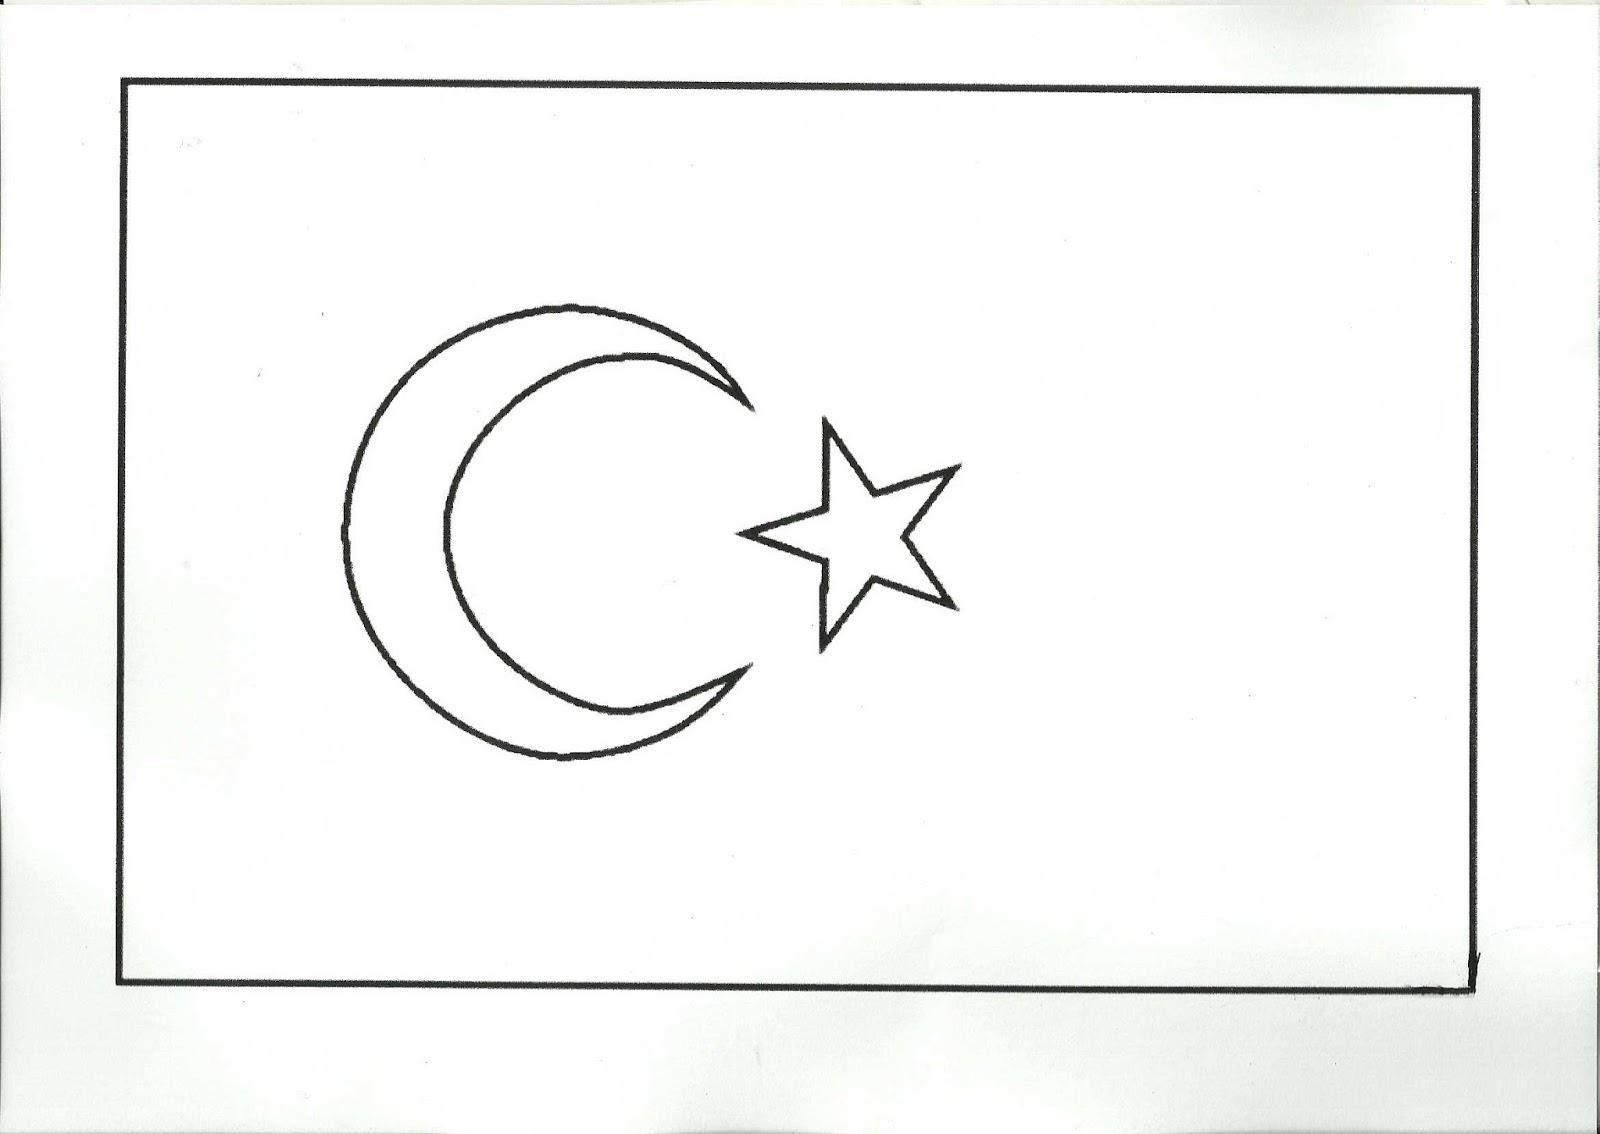 Turk-Bayragi-Boyama-Kagidi-Calismasi-6